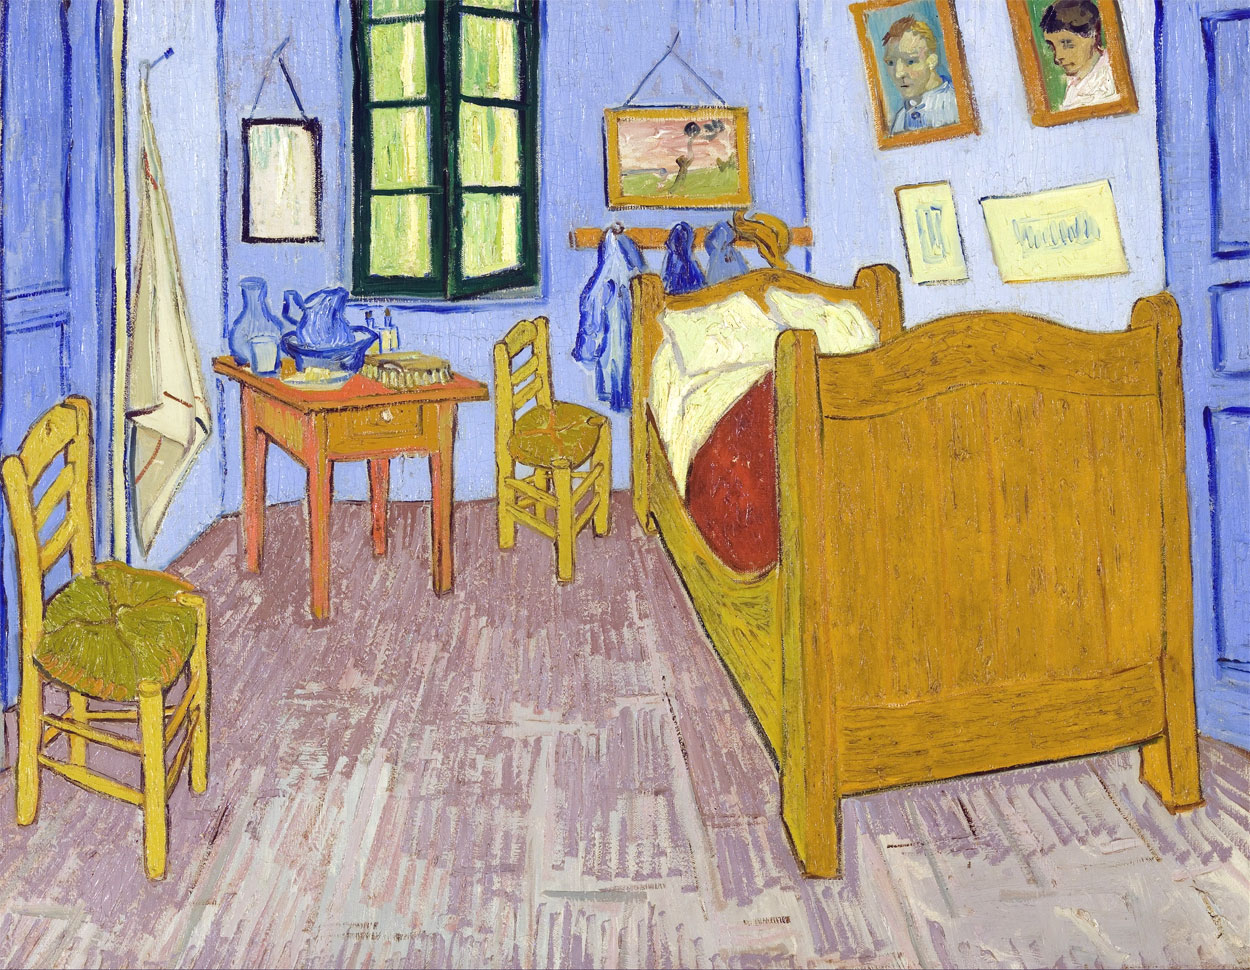 https://cultura.biografieonline.it/wp-content/uploads/2014/05/Stanza-di-Van-Gogh-Arles.jpg